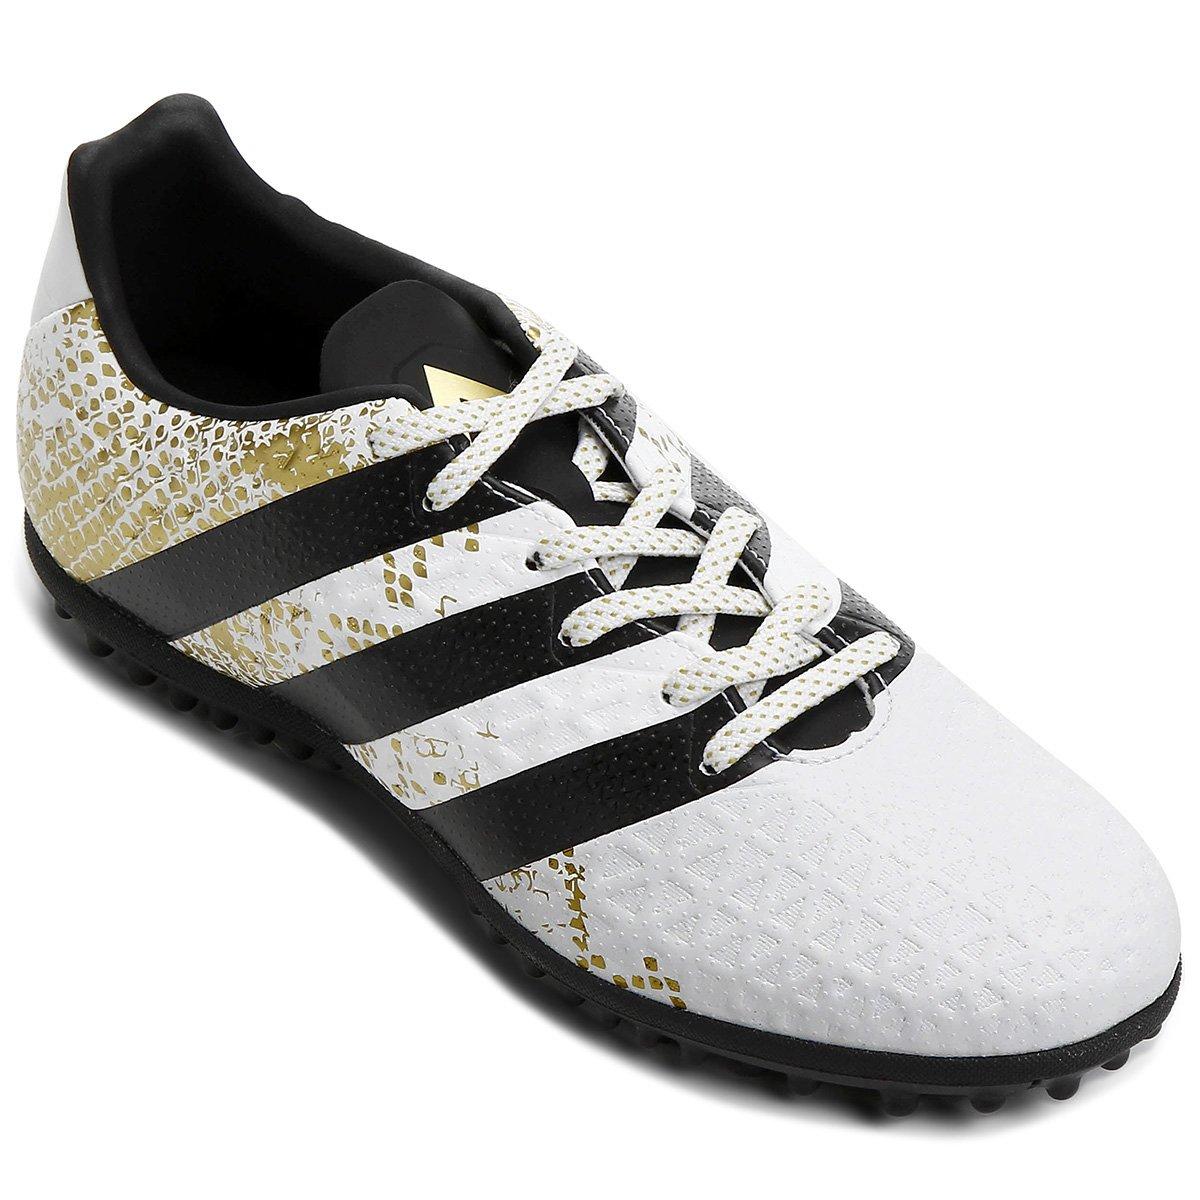 5be7d6c6e8 Chuteira Society Adidas Ace 16.3 TF Masculina - Branco e Preto ...